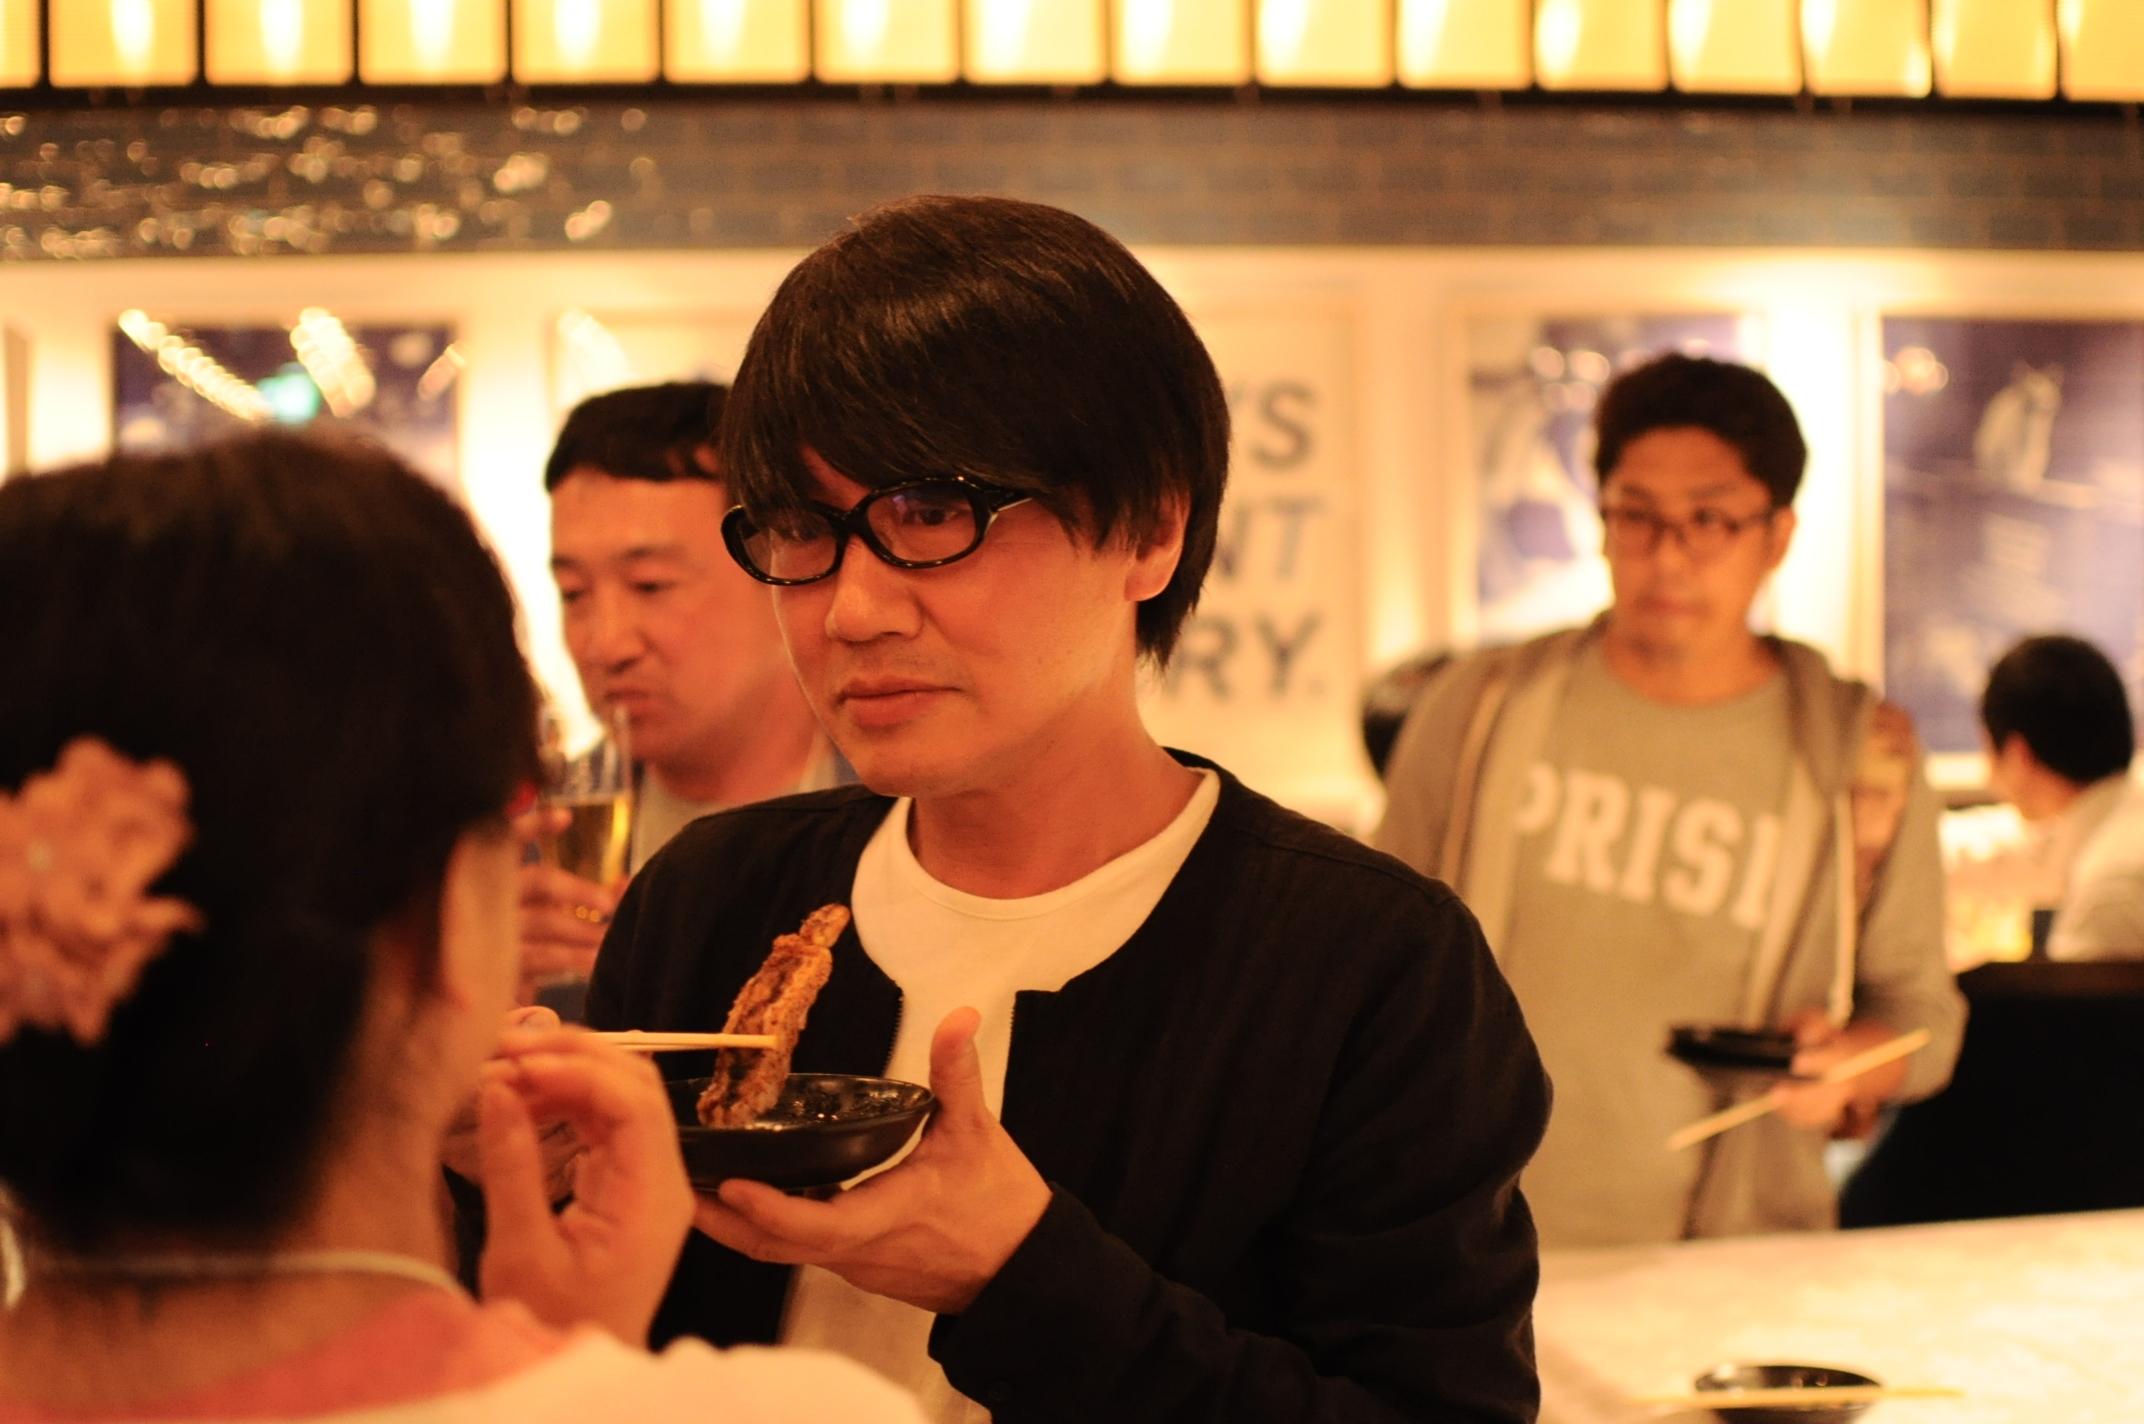 鹿野淳  Photo by Taiyo Kazama